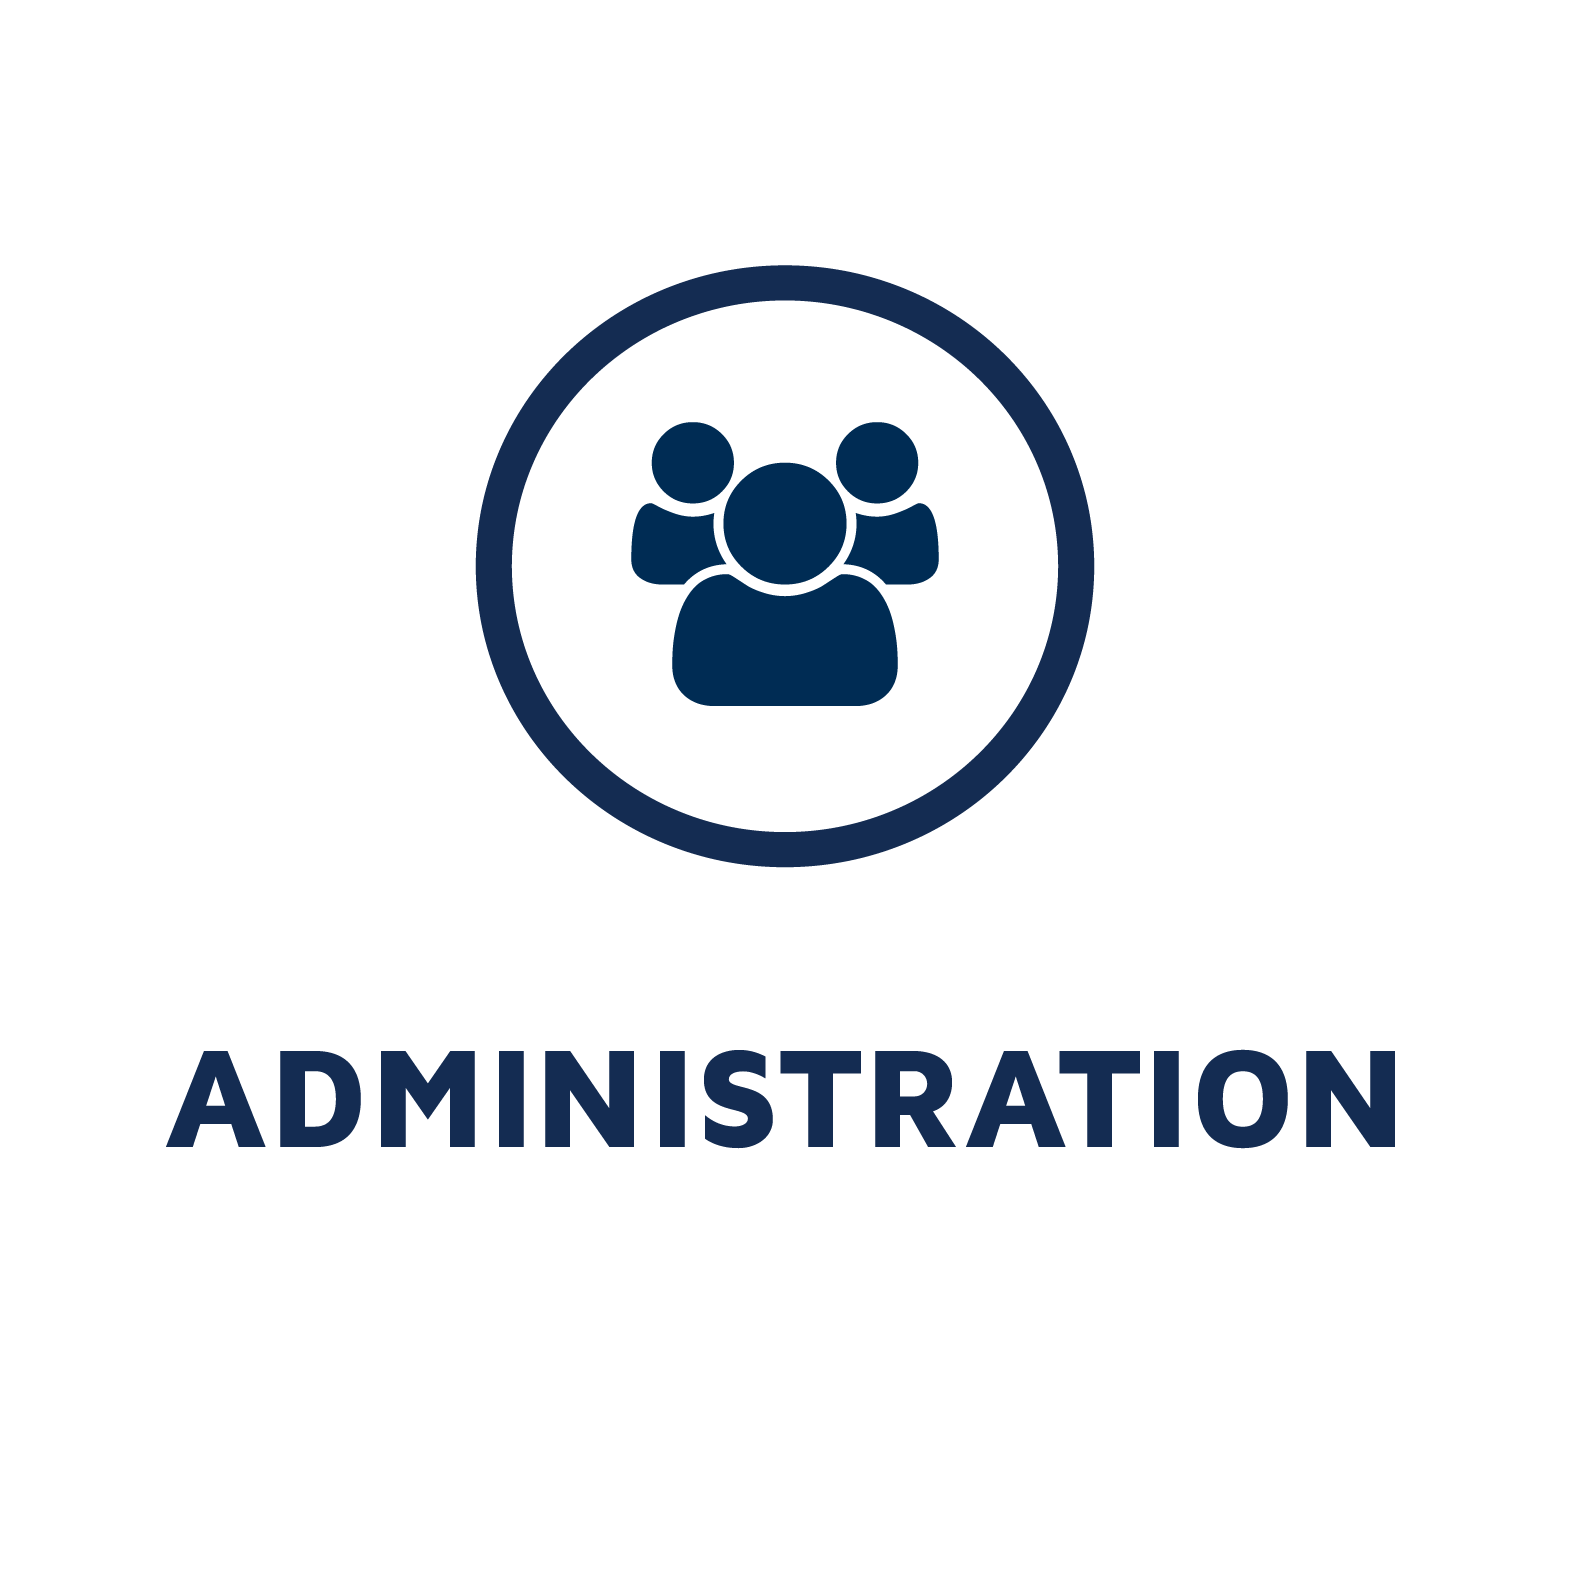 Administration Tile